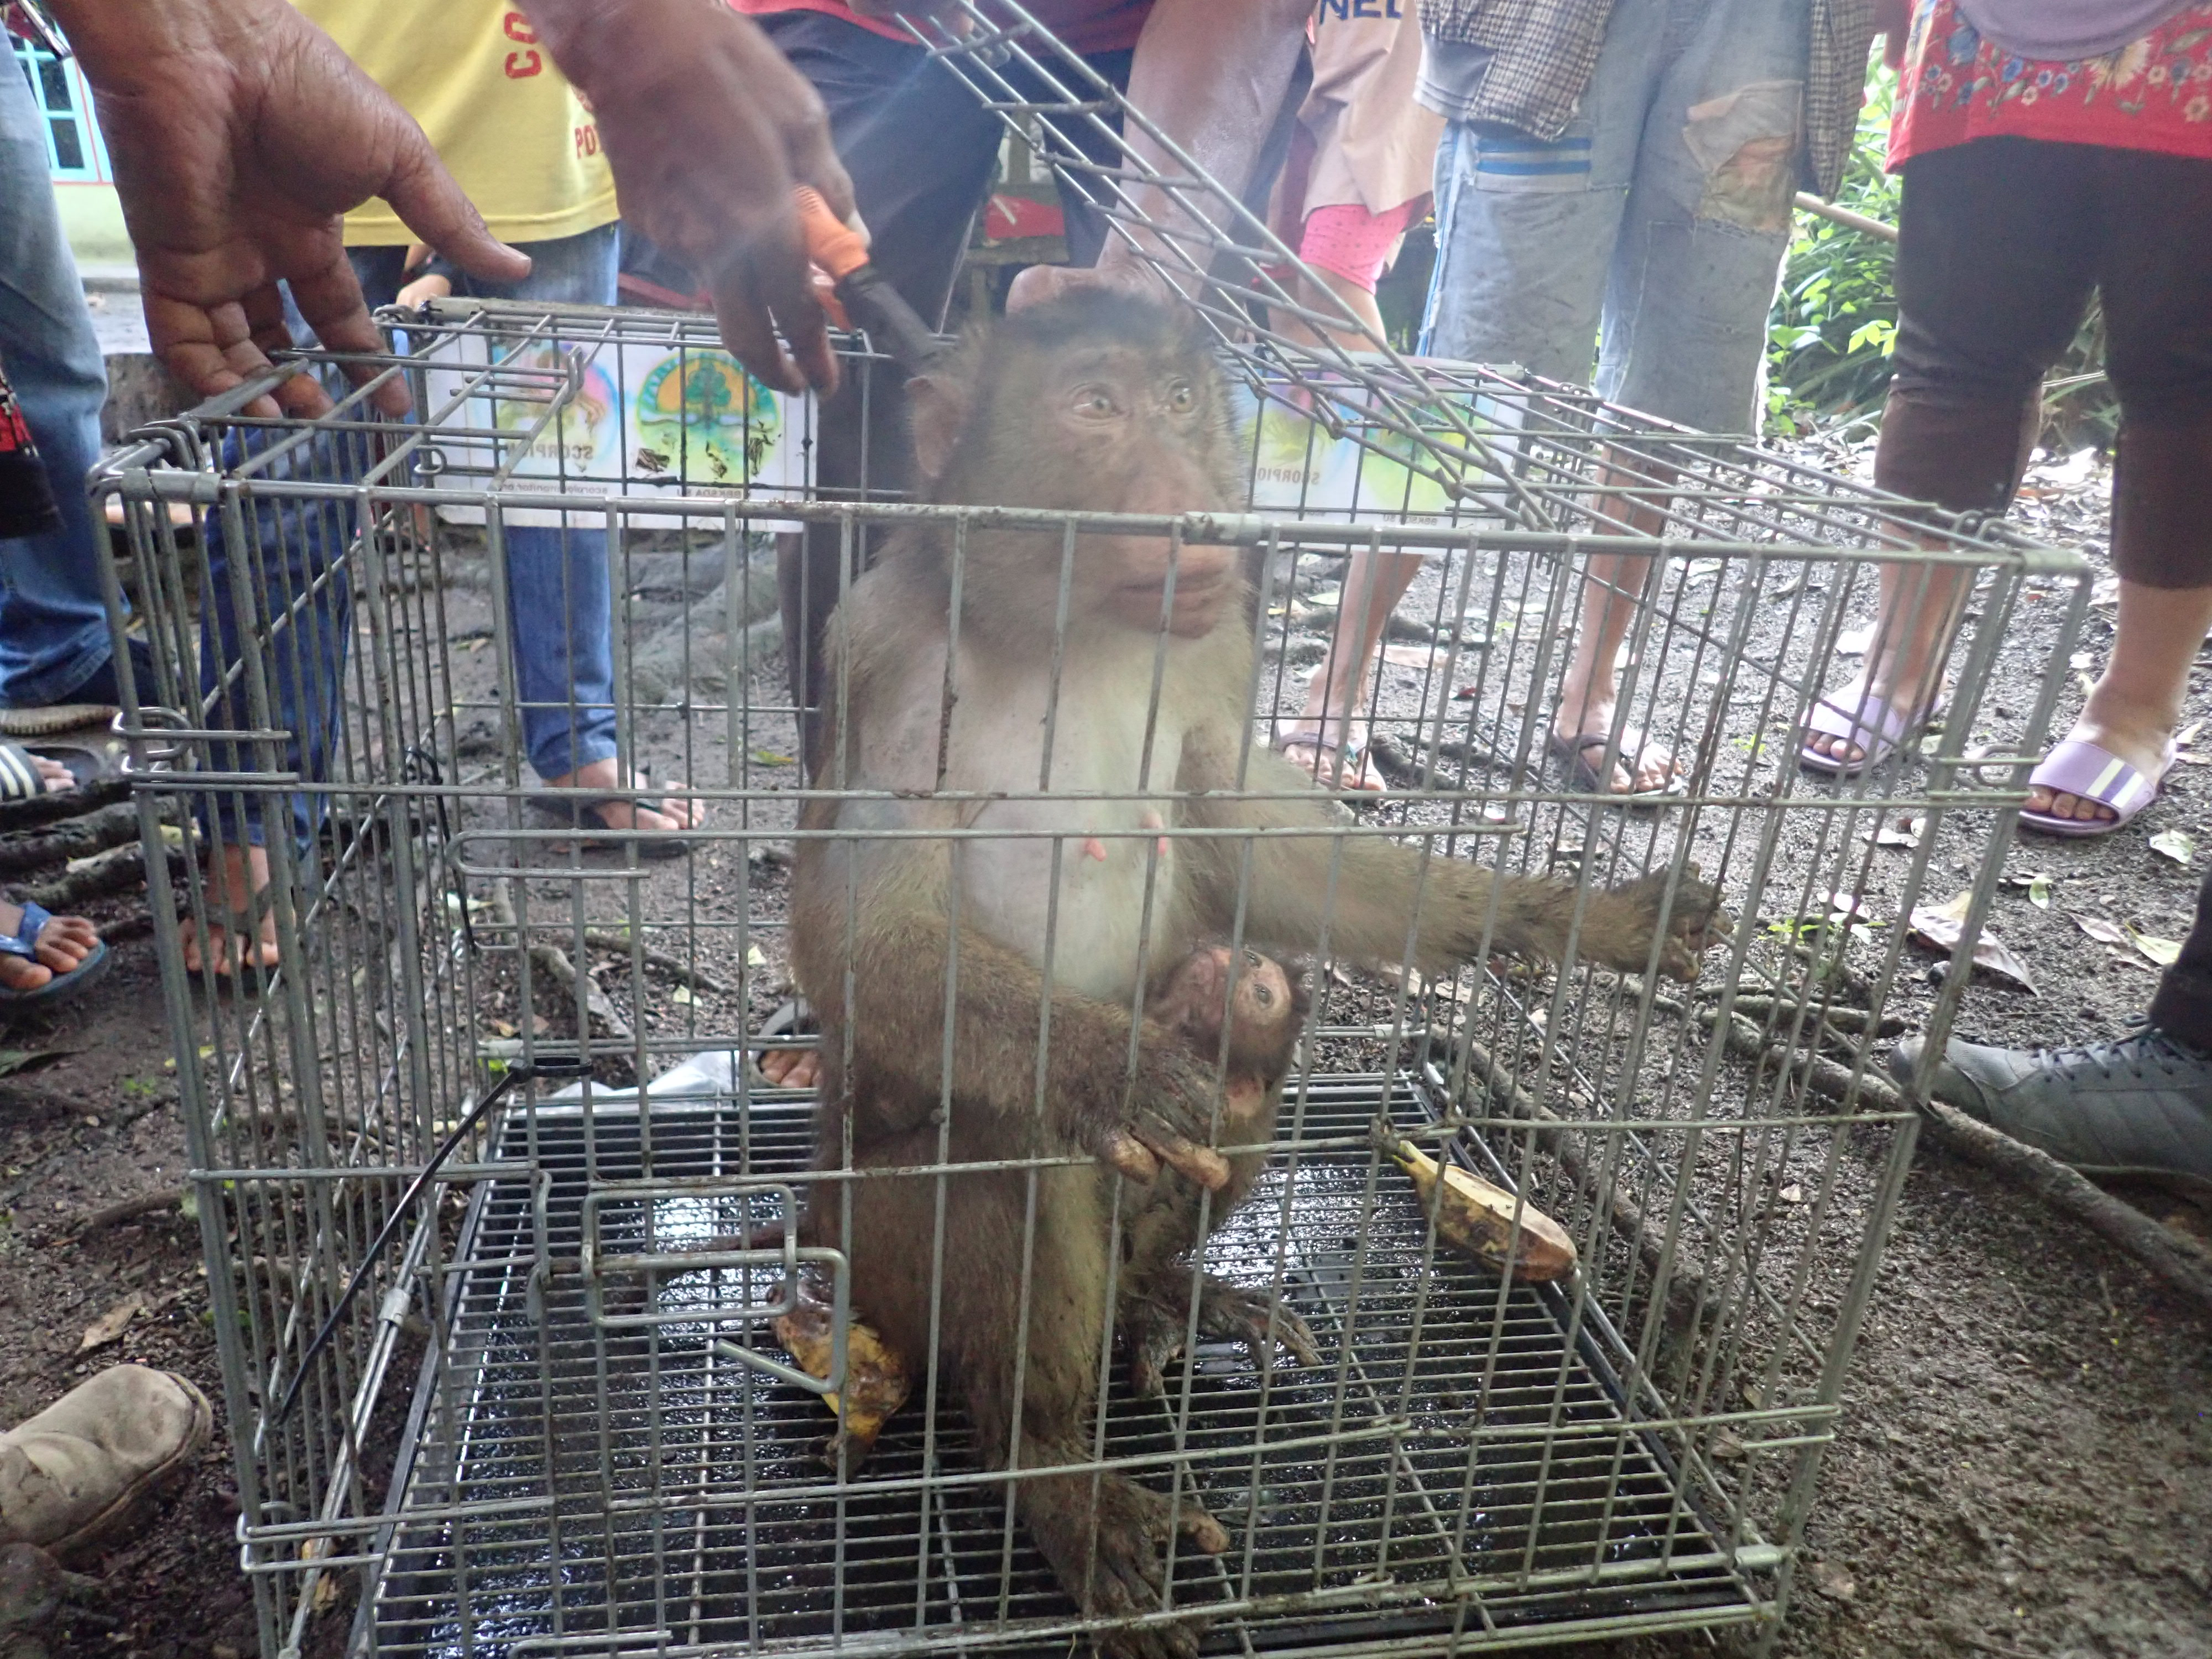 Evacuation of three pig-tail macaques in Simalungun, Sumatera (April 27, 2020)